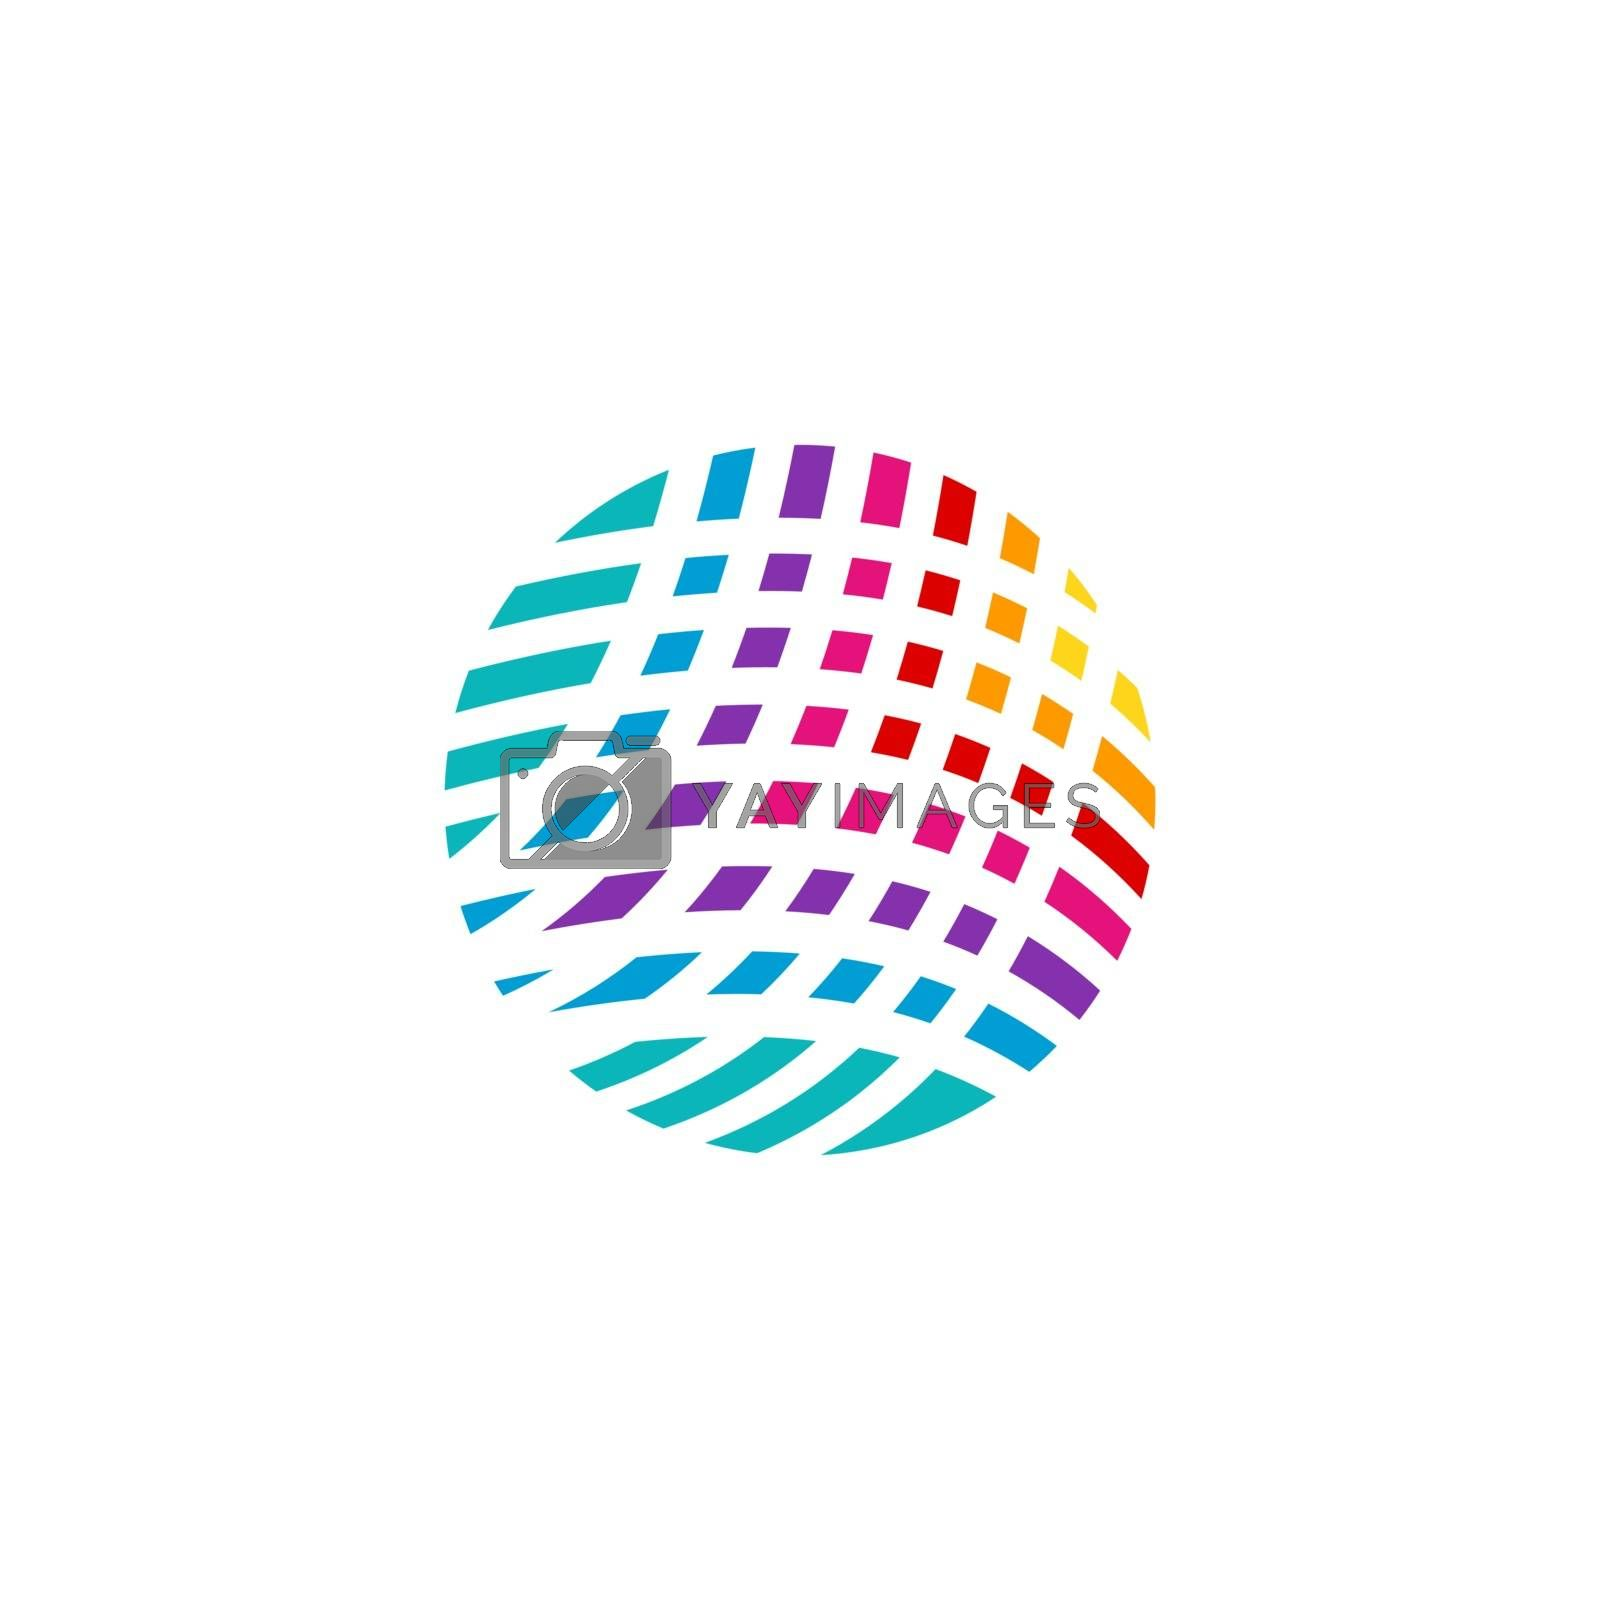 global sphere elements geometric digital abstract logo symbol icon vector design illustration